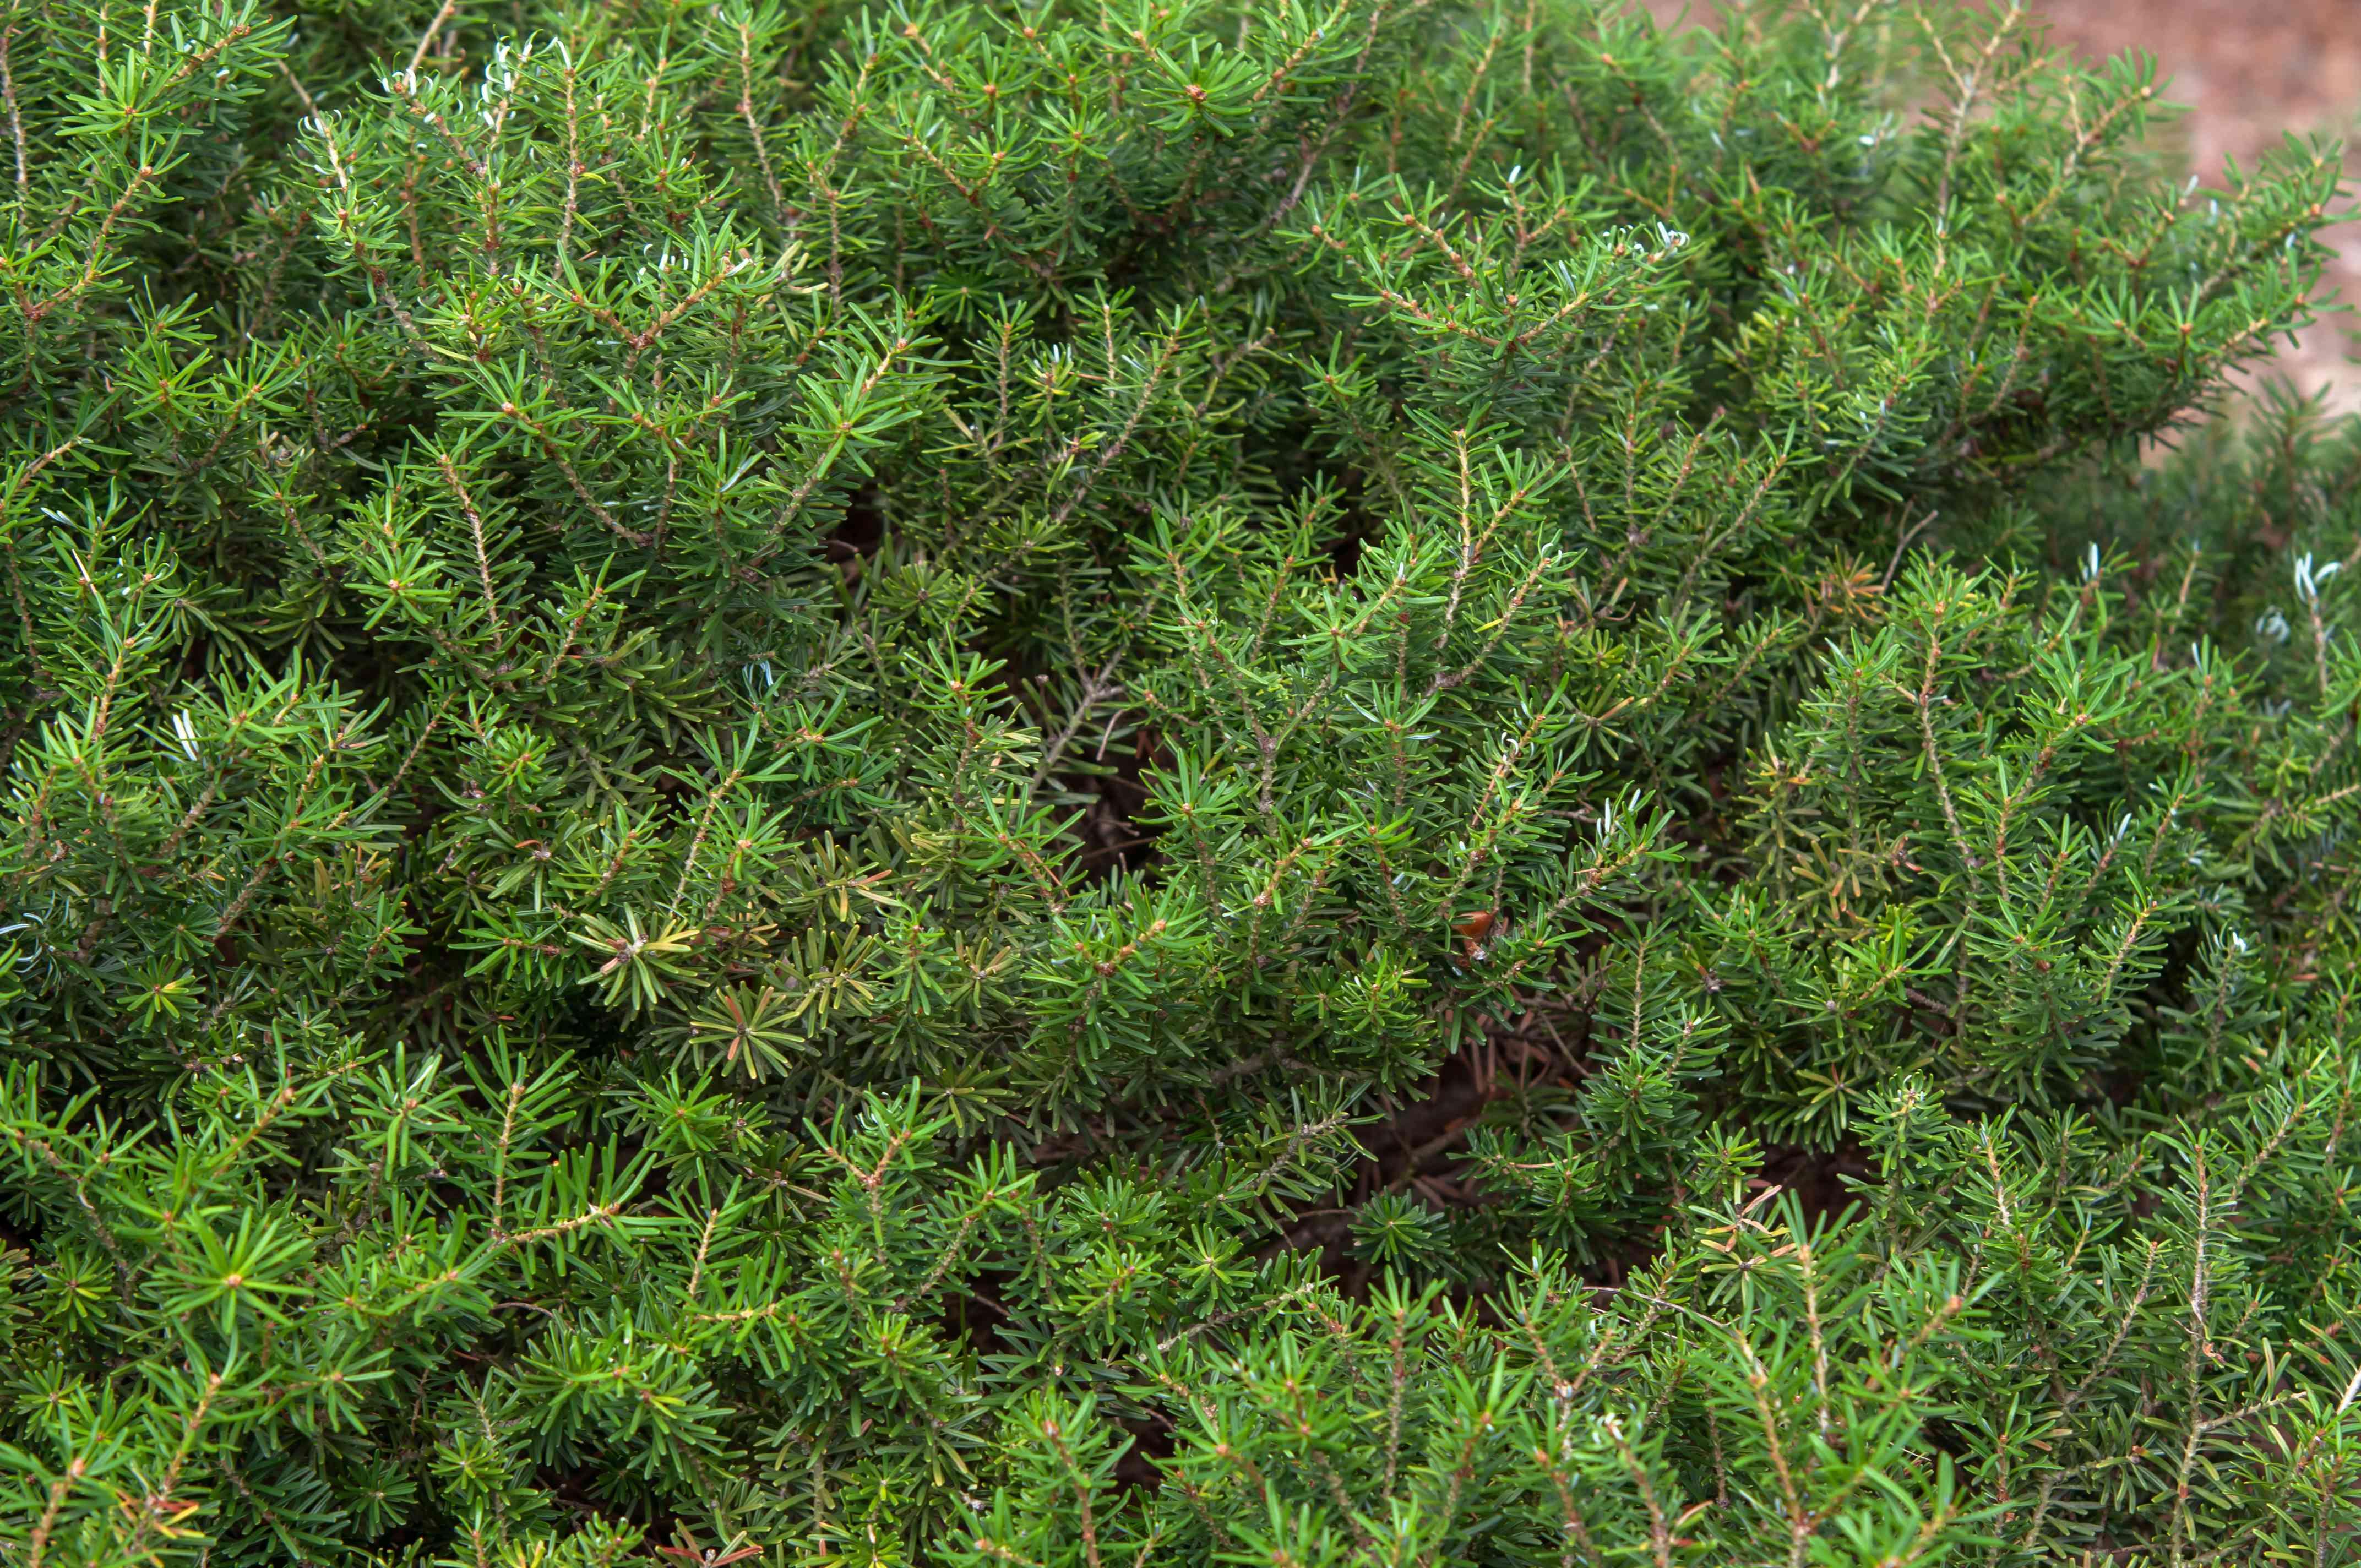 Korean fir branches with short and dense needles